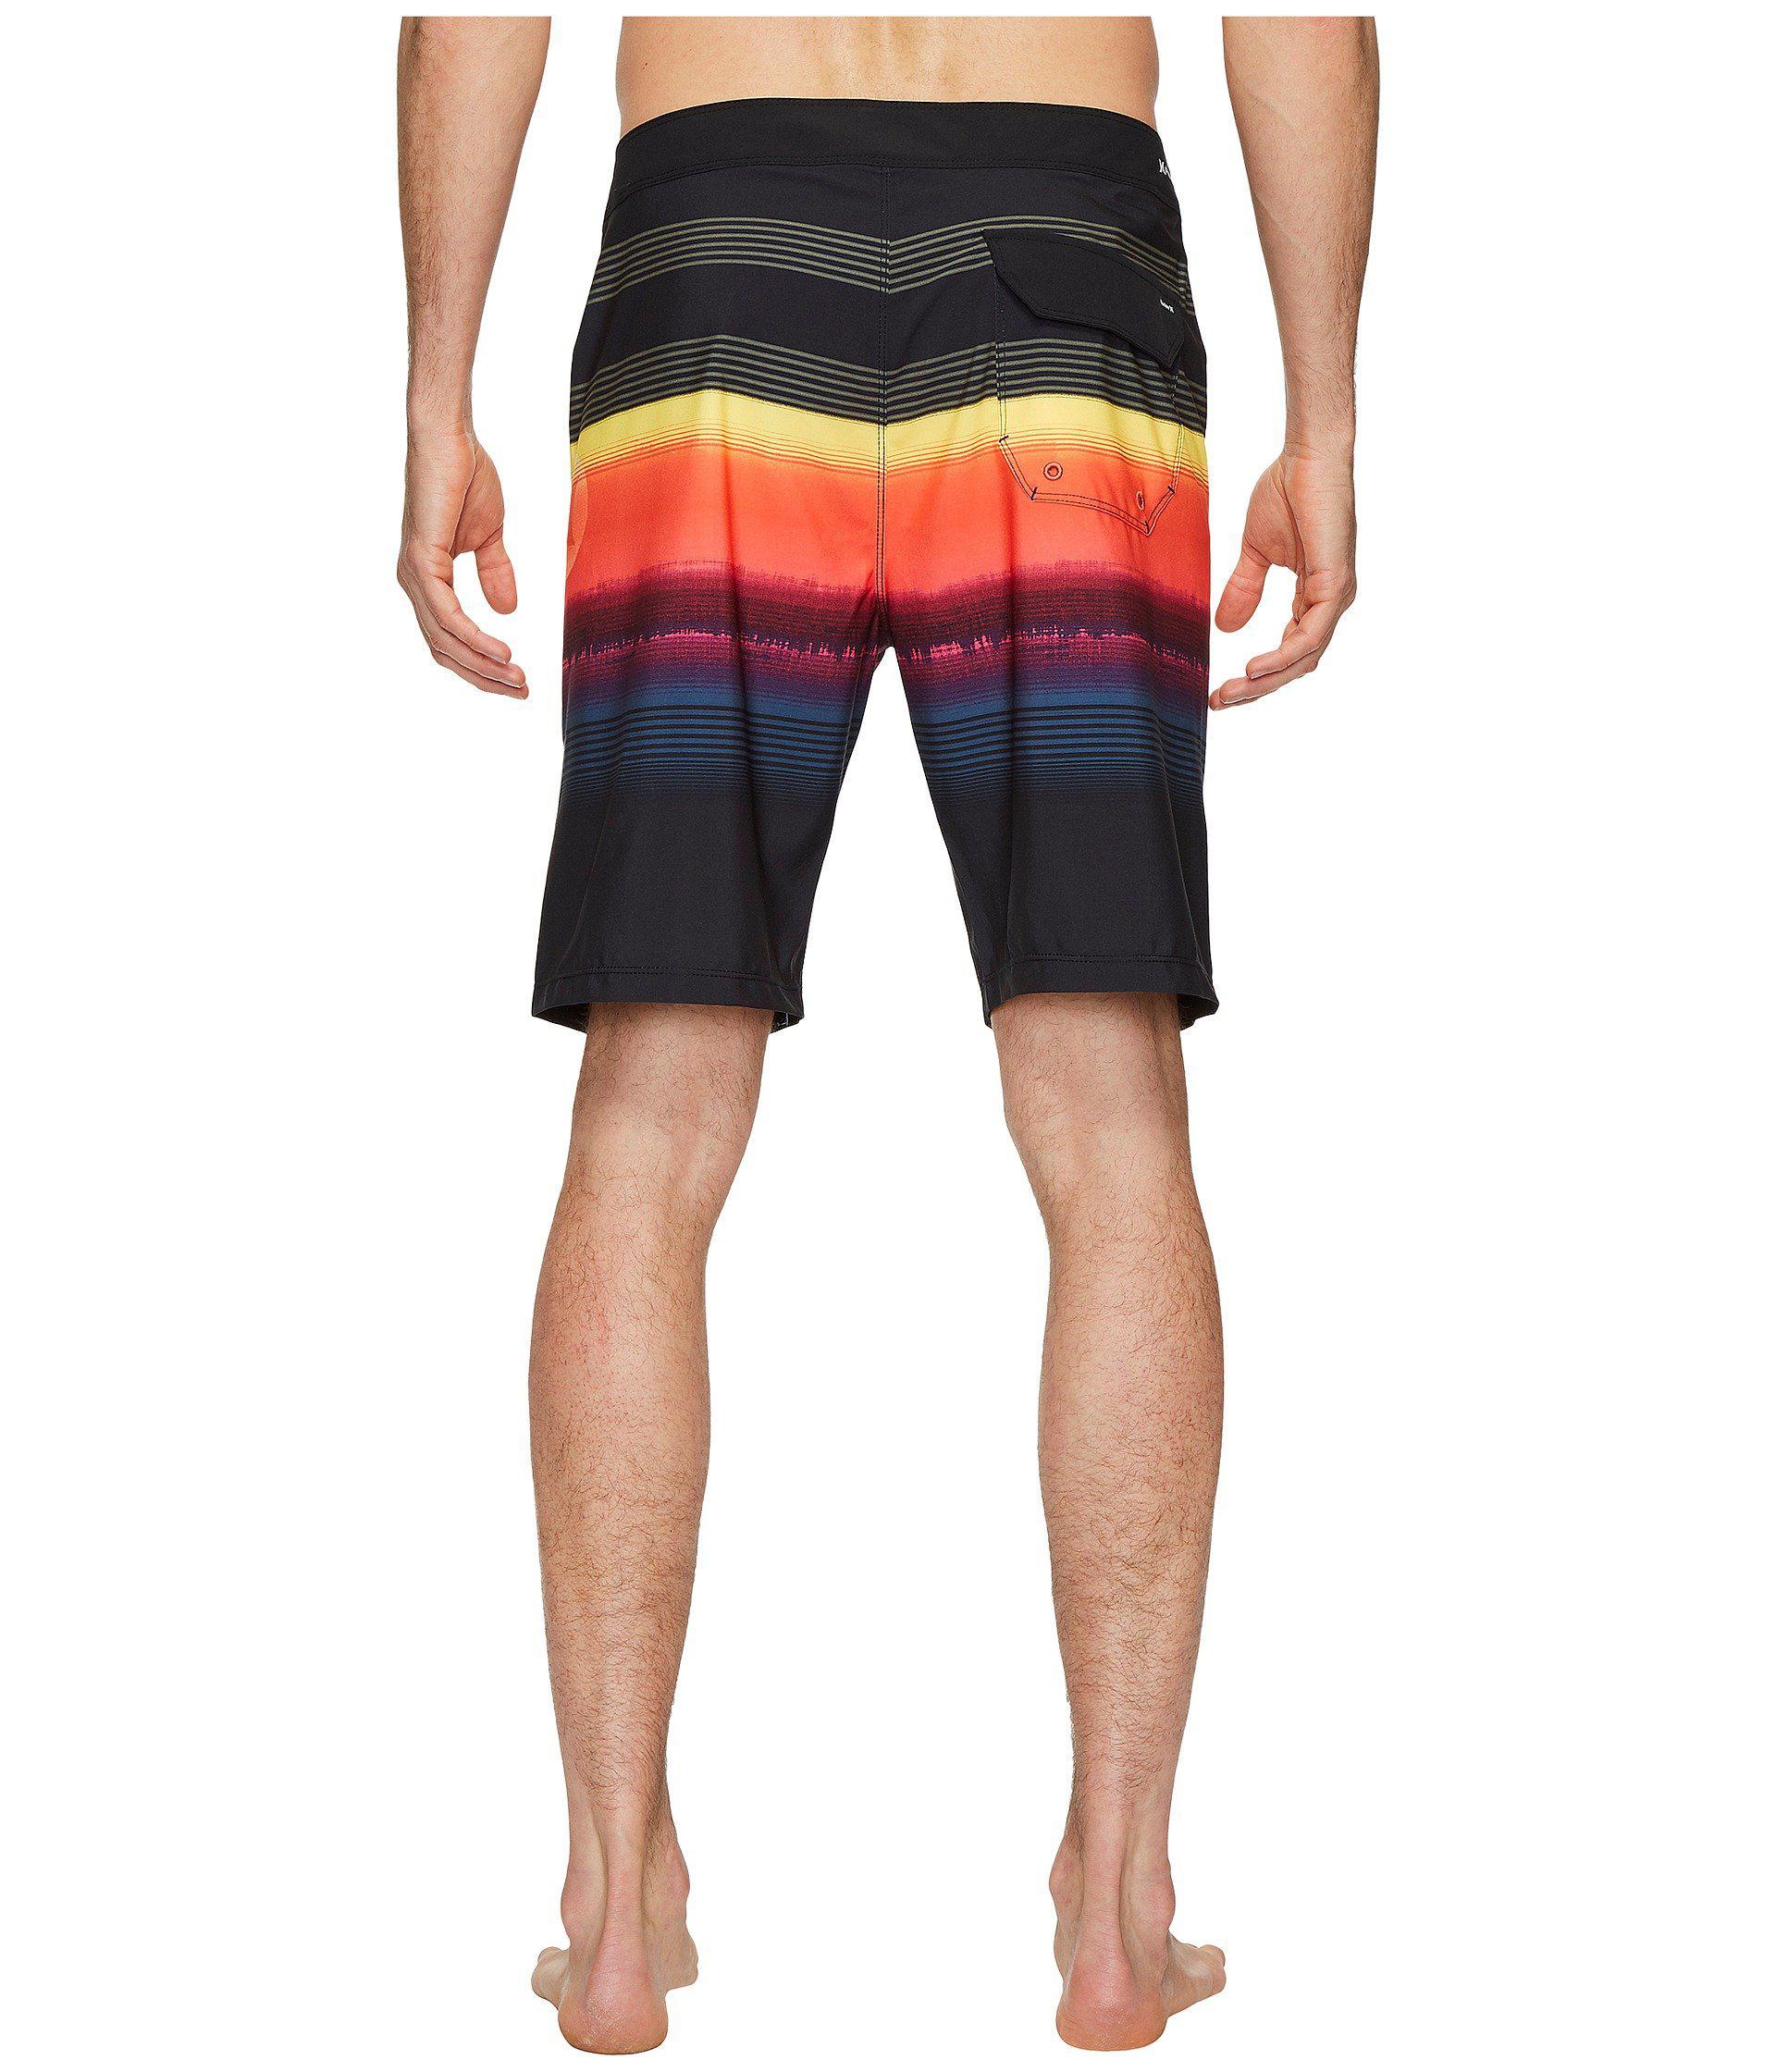 YOIGNG Boardshorts Sunflowers Mens Quick Dry Swim Trunks Beach Shorts